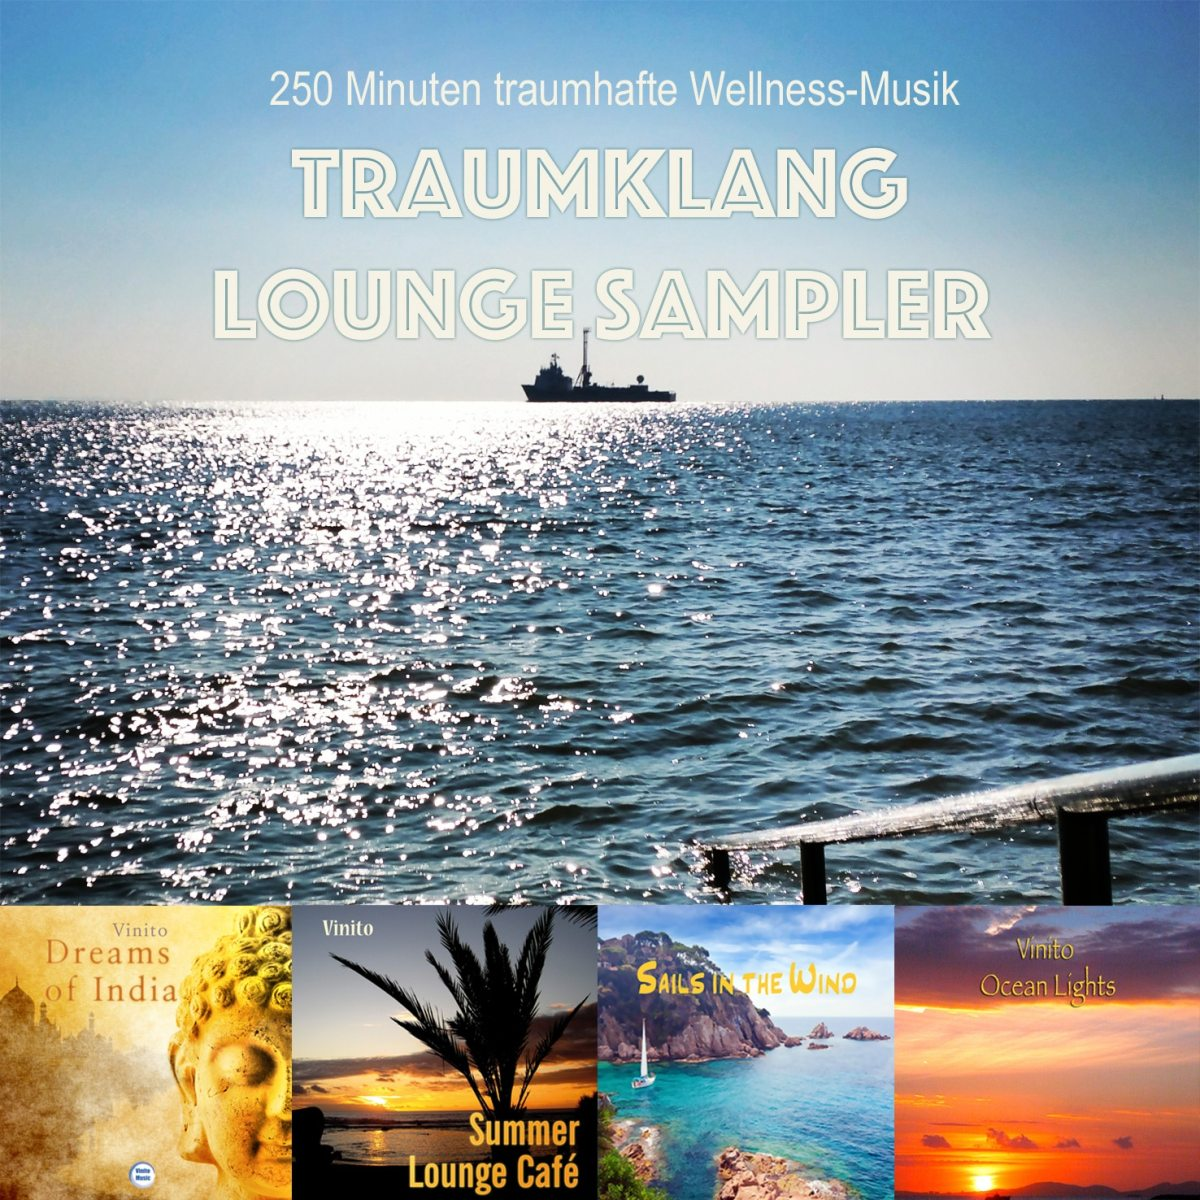 Traumklang-Lounge Sampler – 4 Stunden gemafreie Wellnessmusik